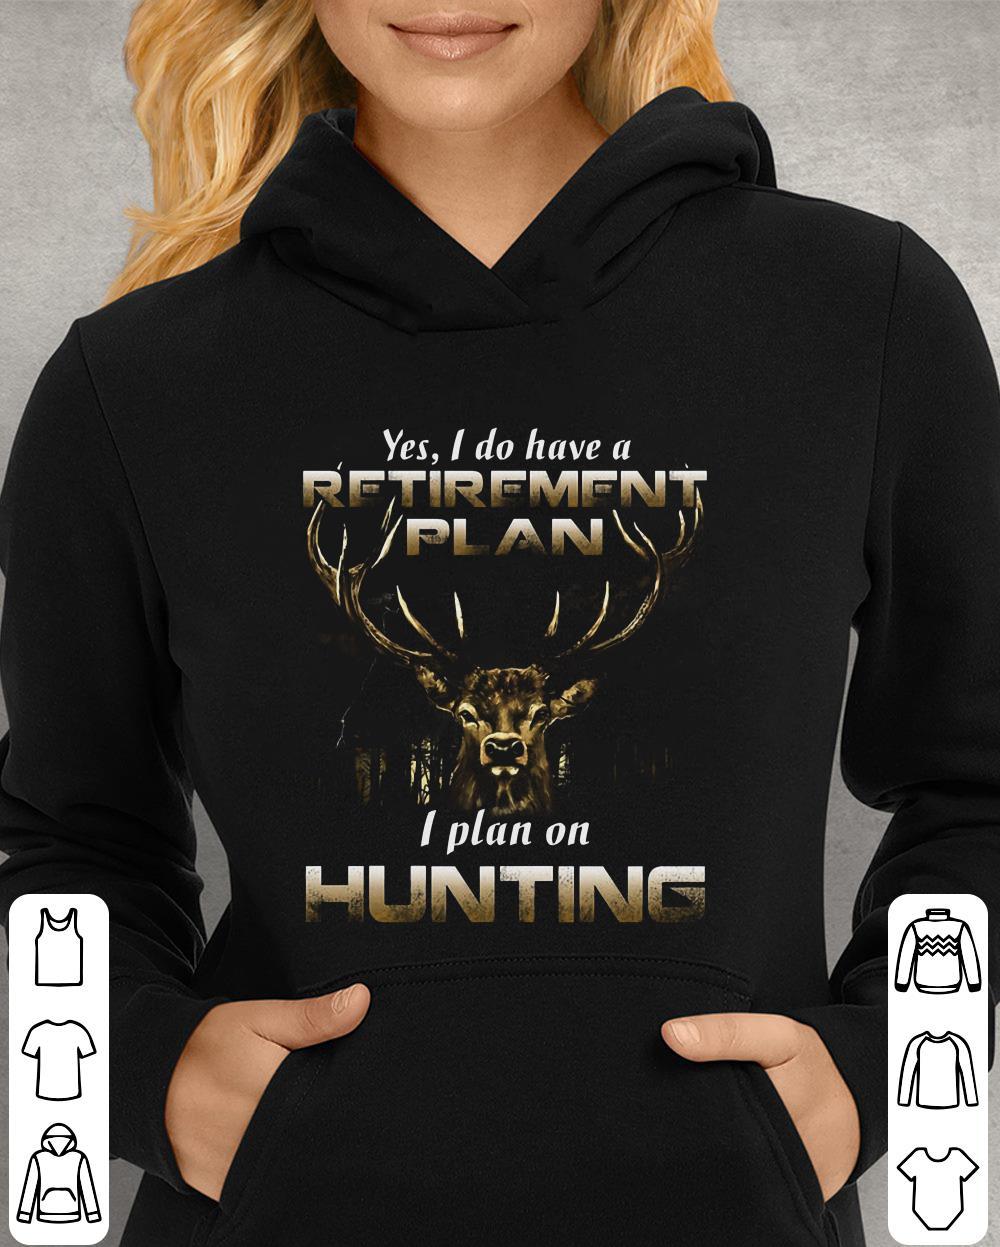 https://unicornshirts.net/images/2018/11/Yes-I-do-have-a-retirement-plan-I-plan-on-Hunting-shirt_4.jpg